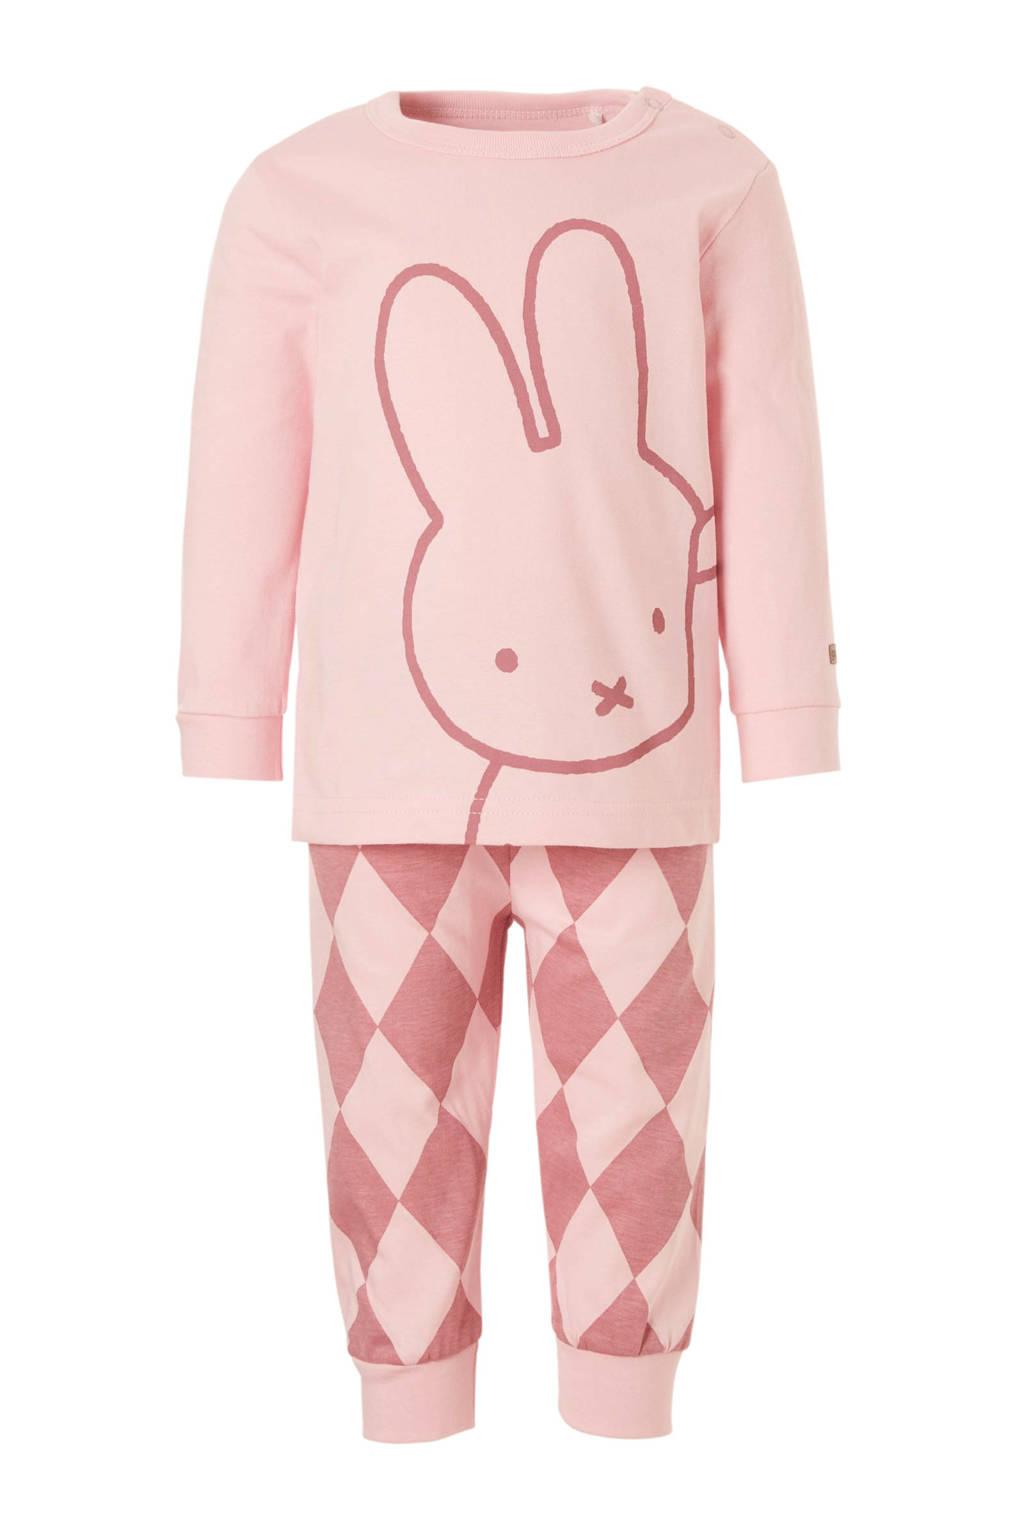 nijntje pyjama met print roze, Roze/donkerroze